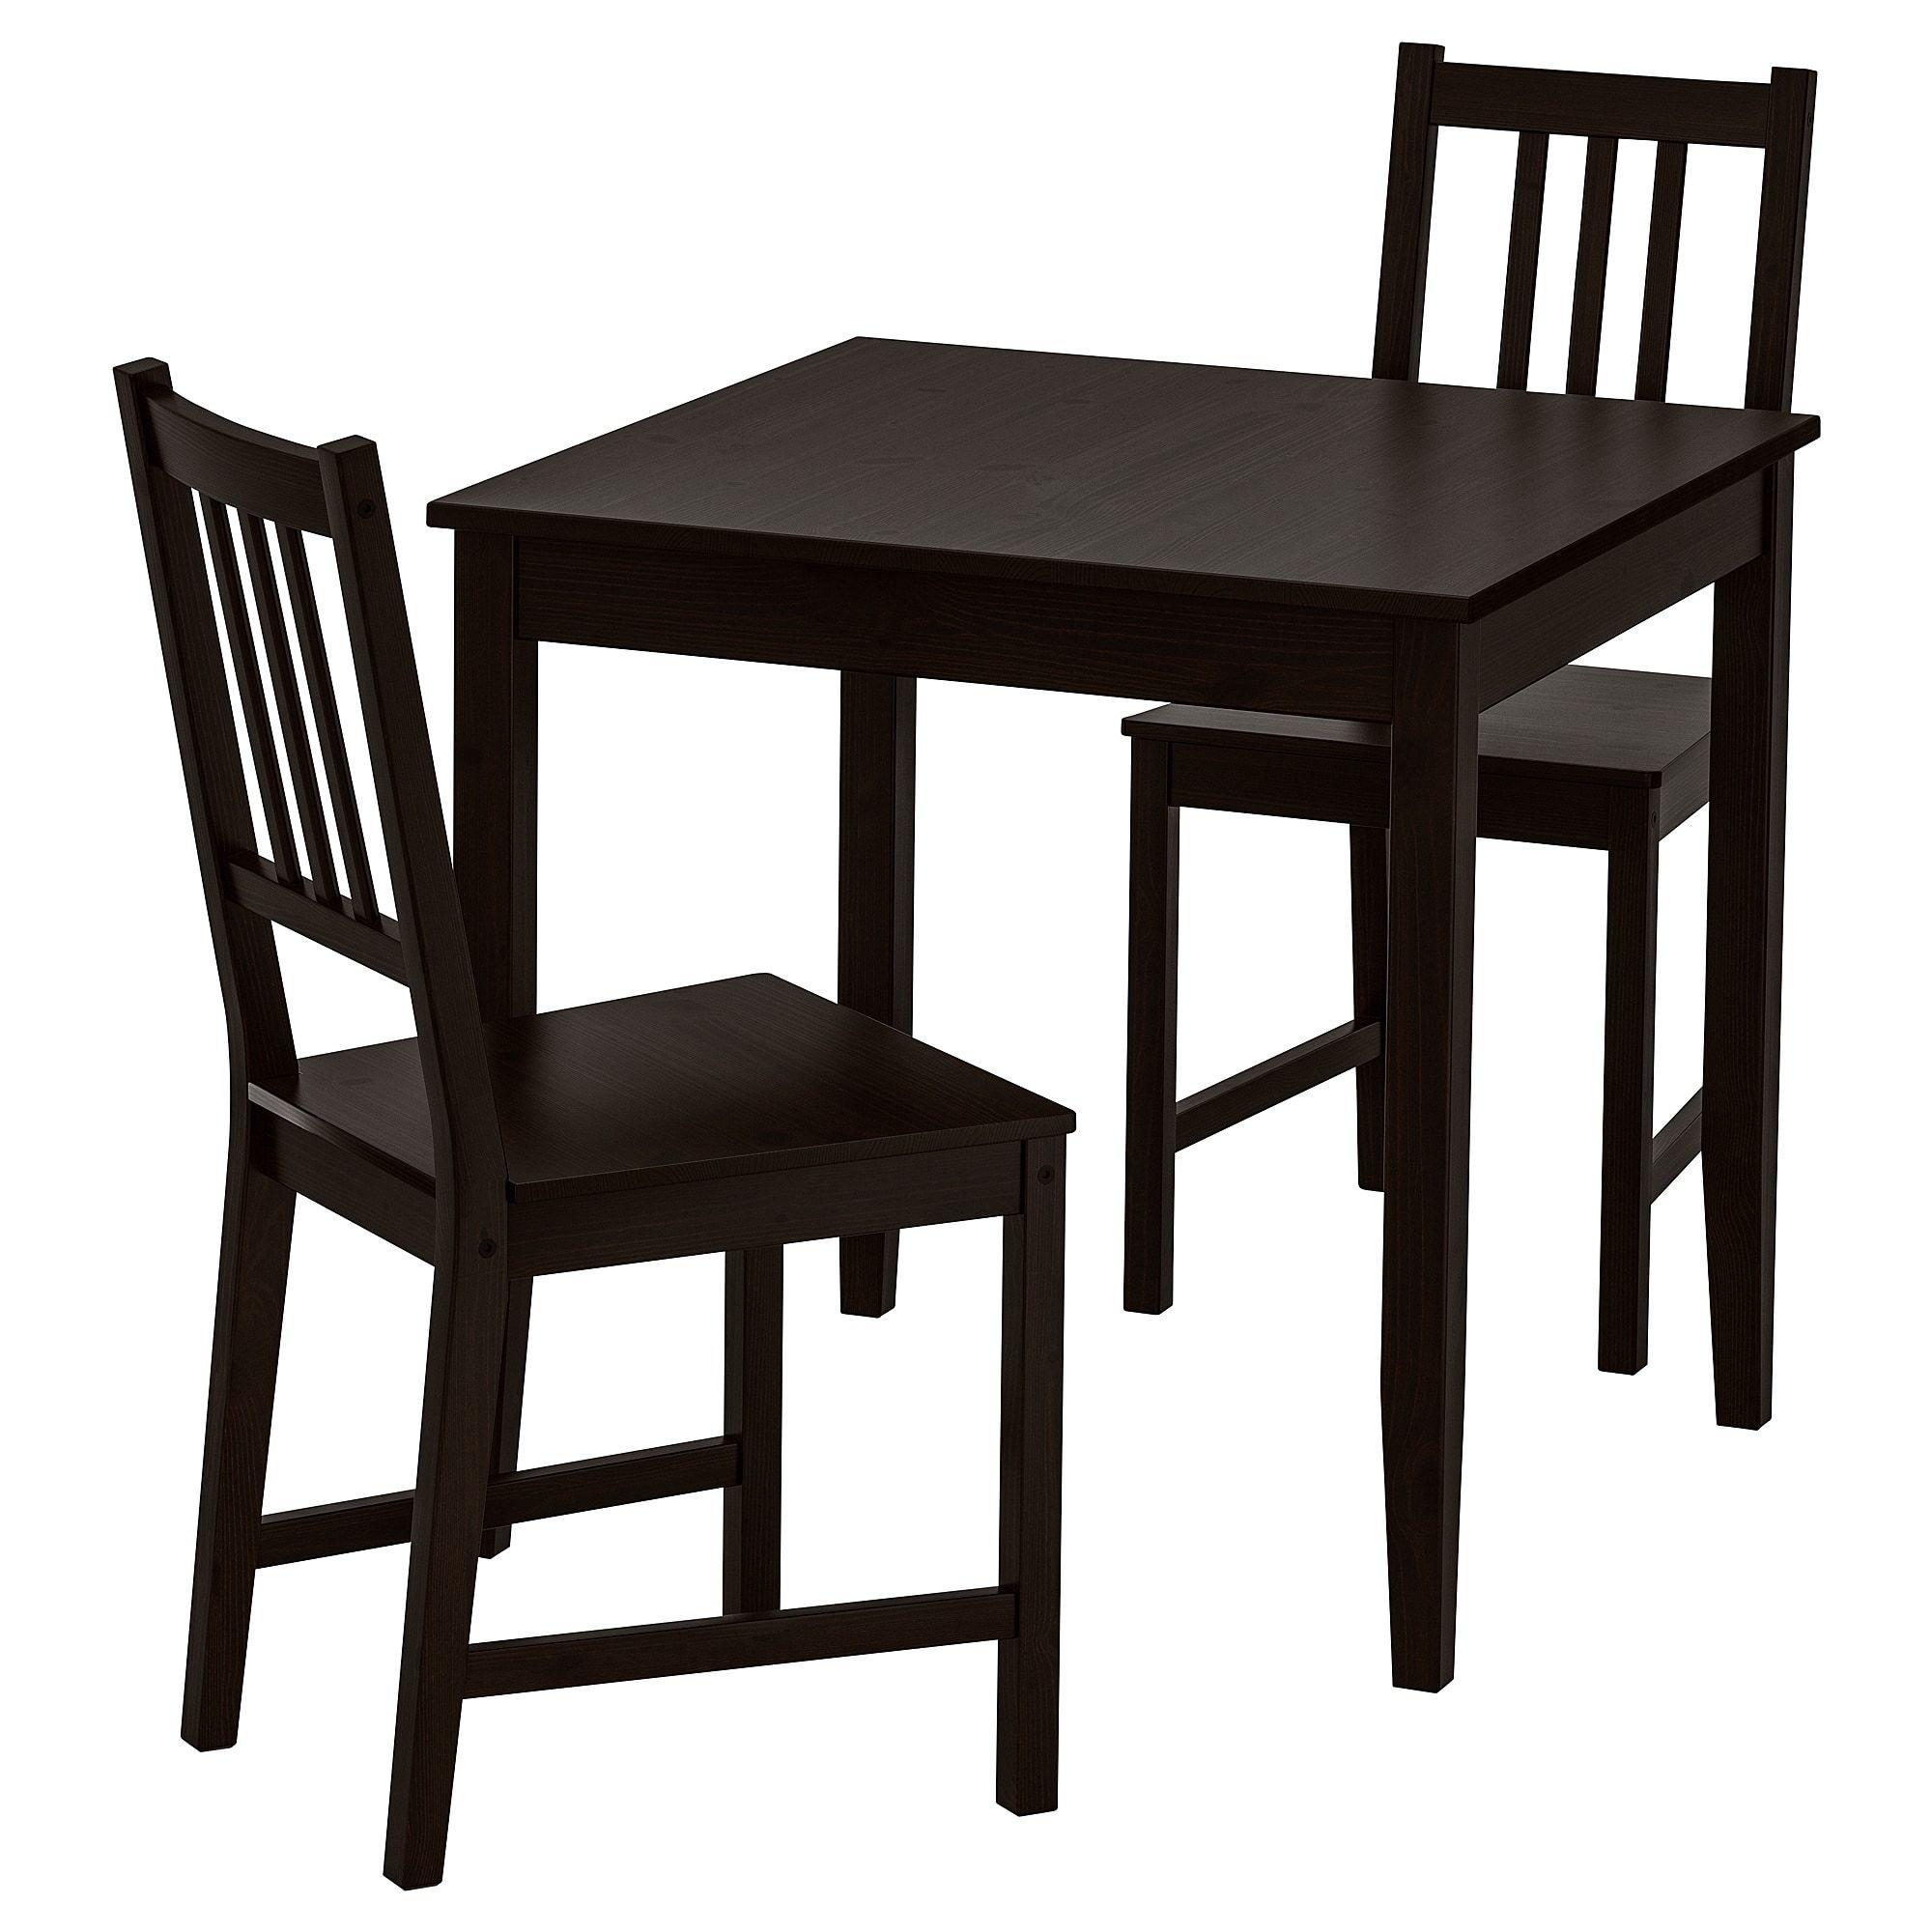 ikea lerhamn stefan table and 2 chairs black brown brown black rh pinterest com